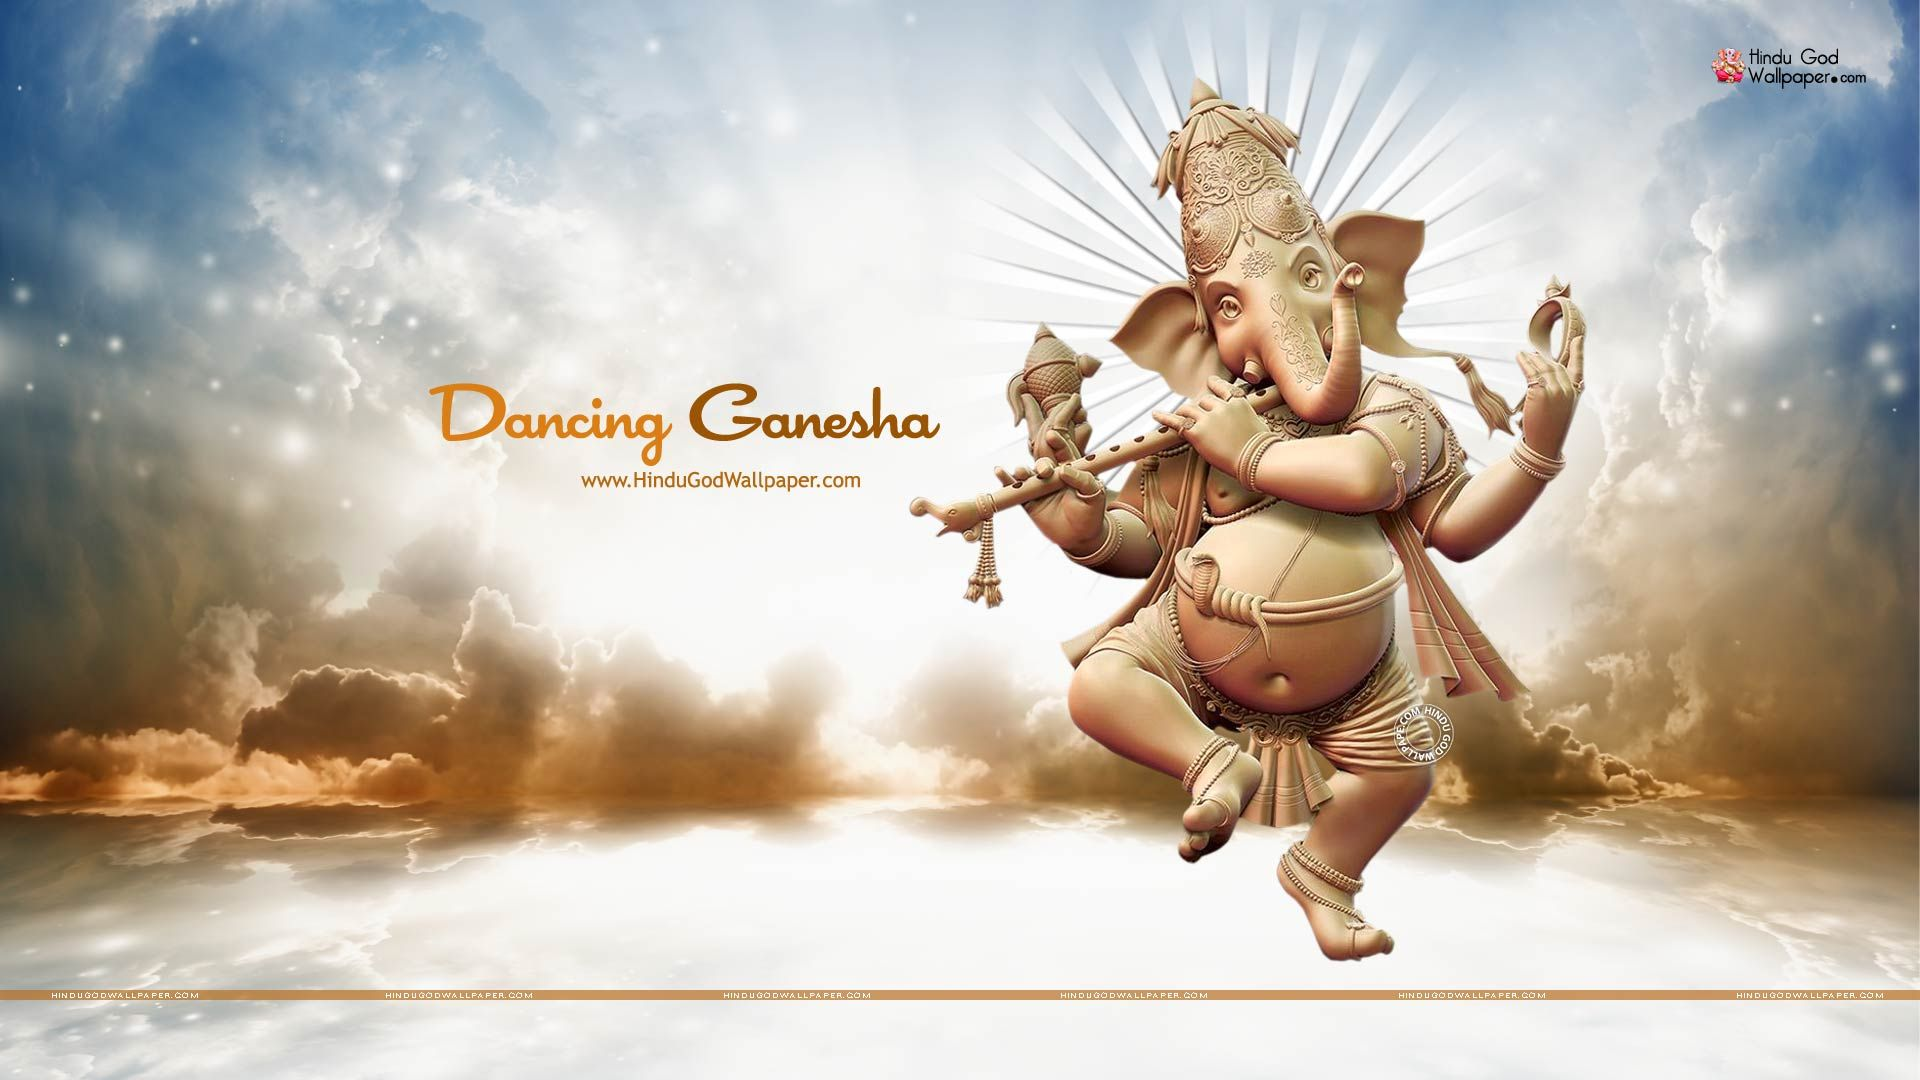 Dancing Ganesh Hd Wallpaper Dancing Ganesha Ganesha Ganesh Wallpaper